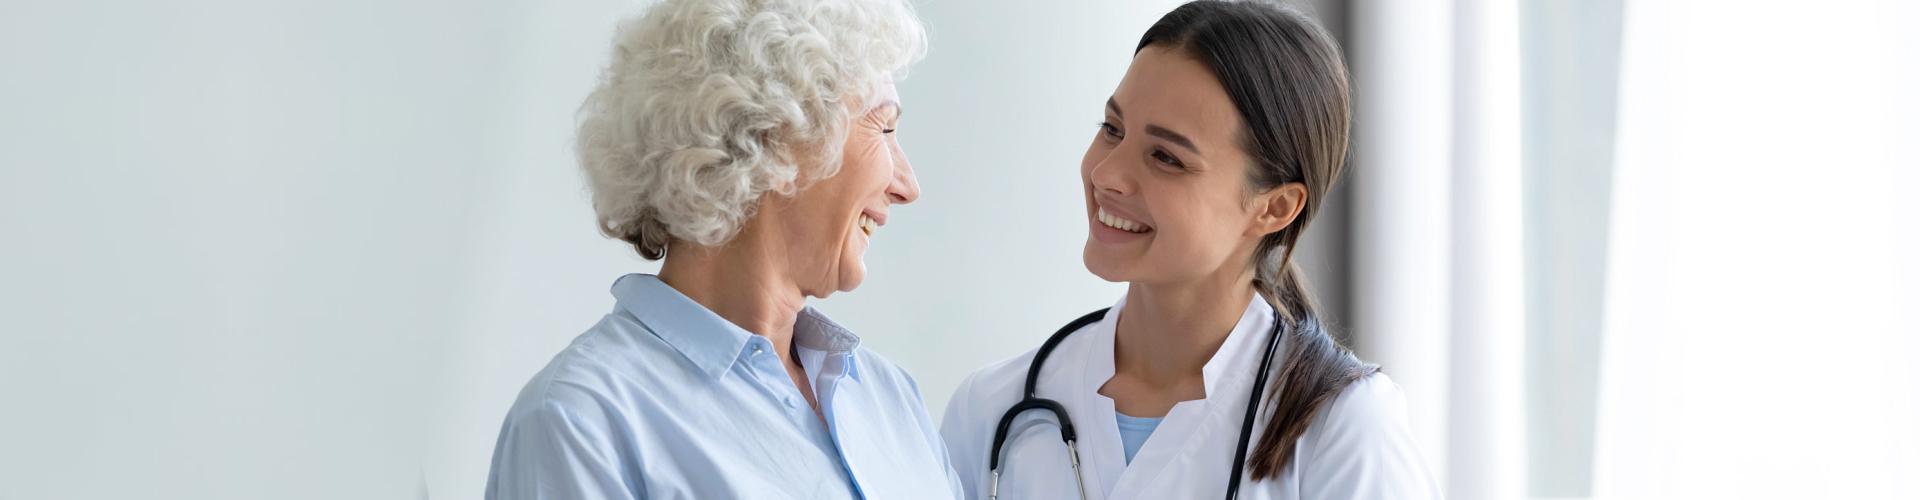 senior woman and nurse talking